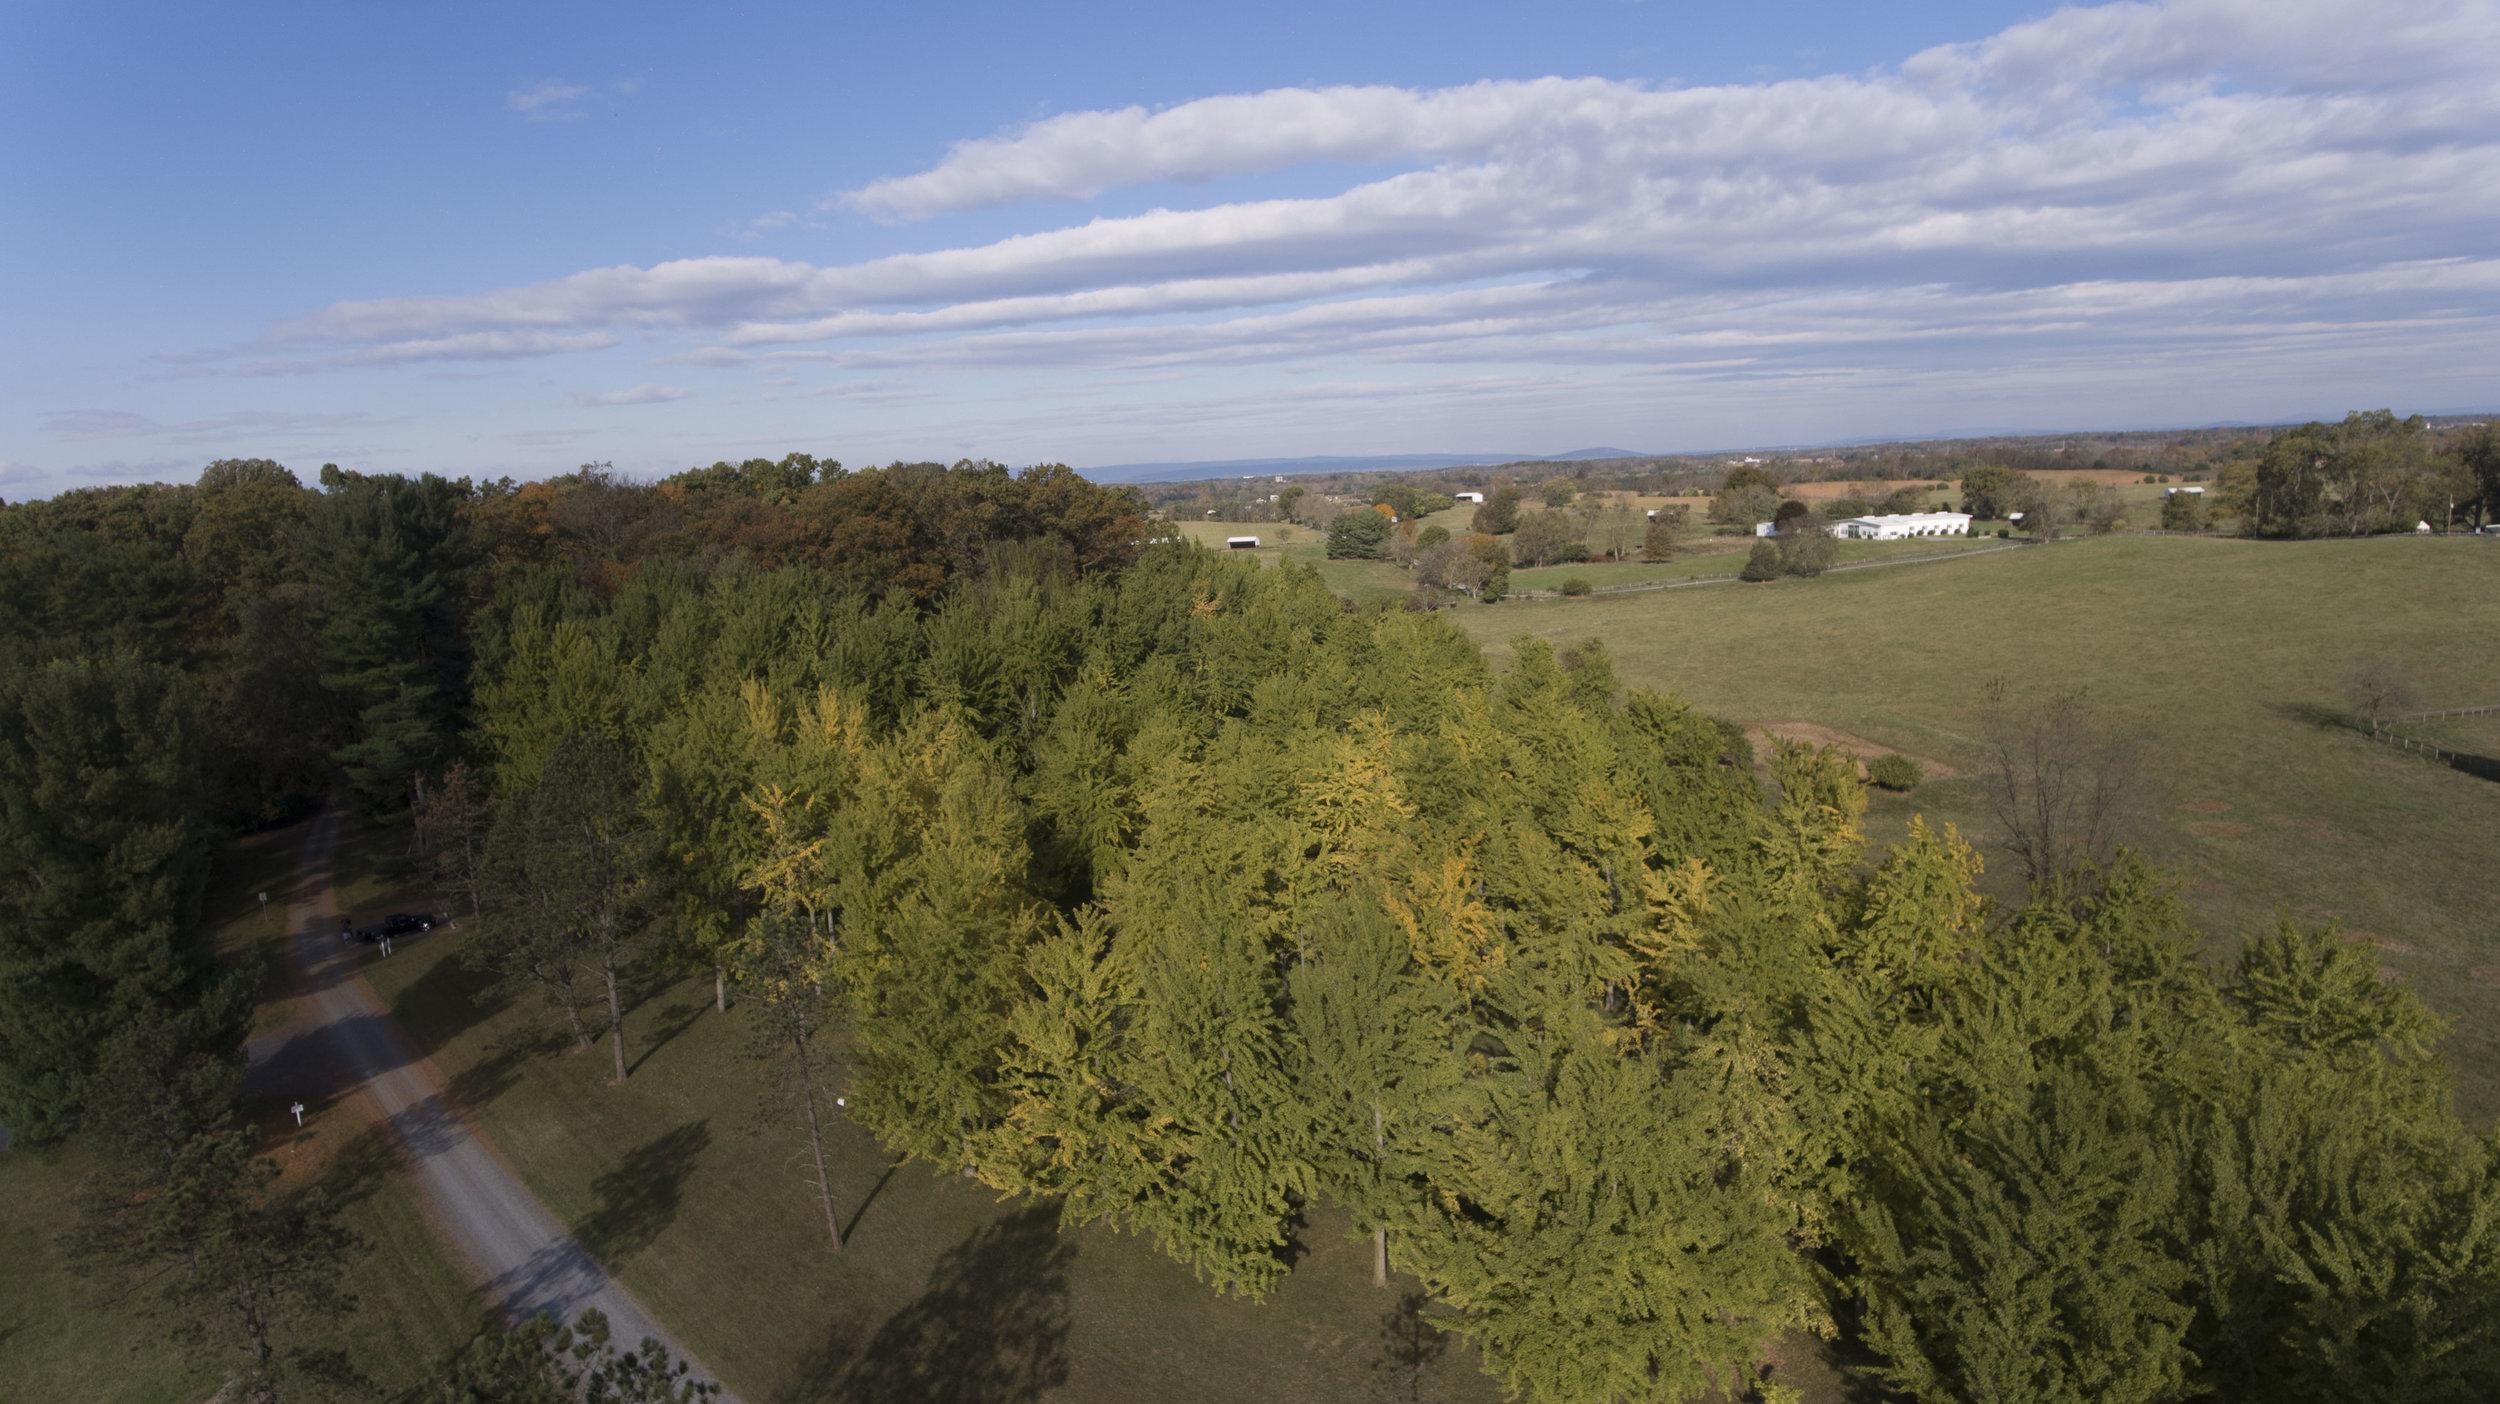 The Ginkgo Grove at Blandy Experimental Farm